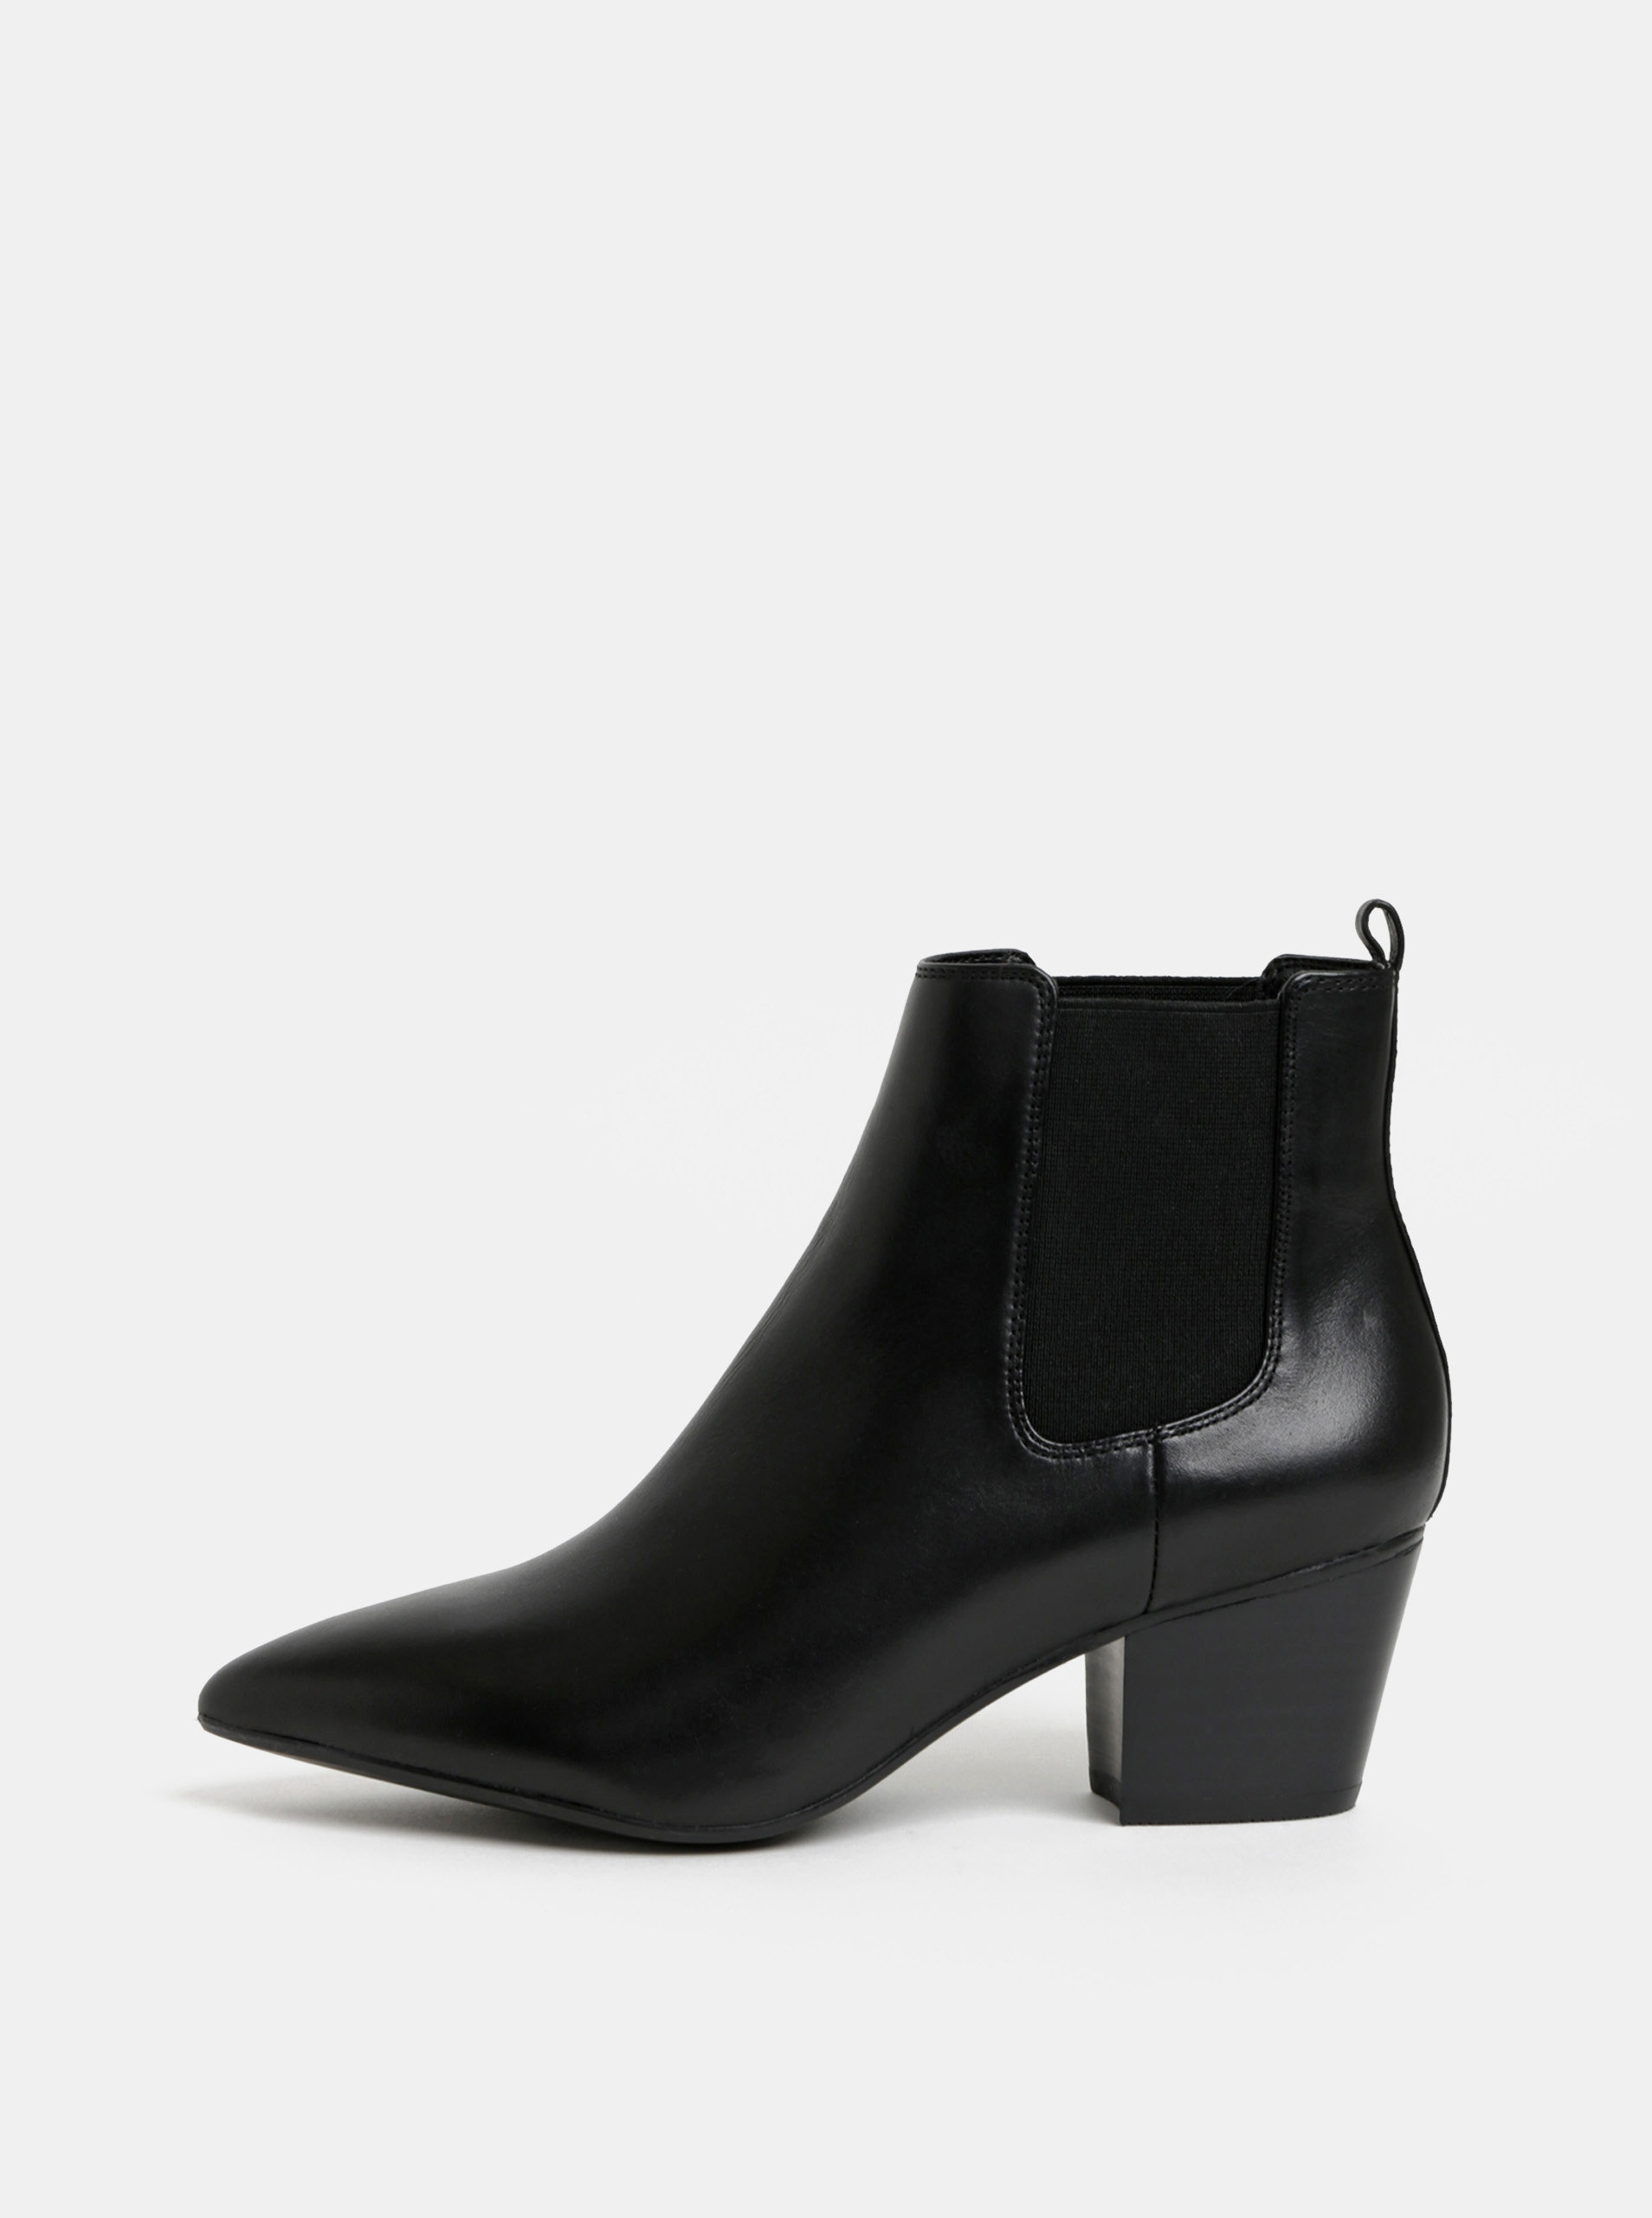 Černé dámské kožené chelsea boty ALDO Grillan ... 8a5f25e182